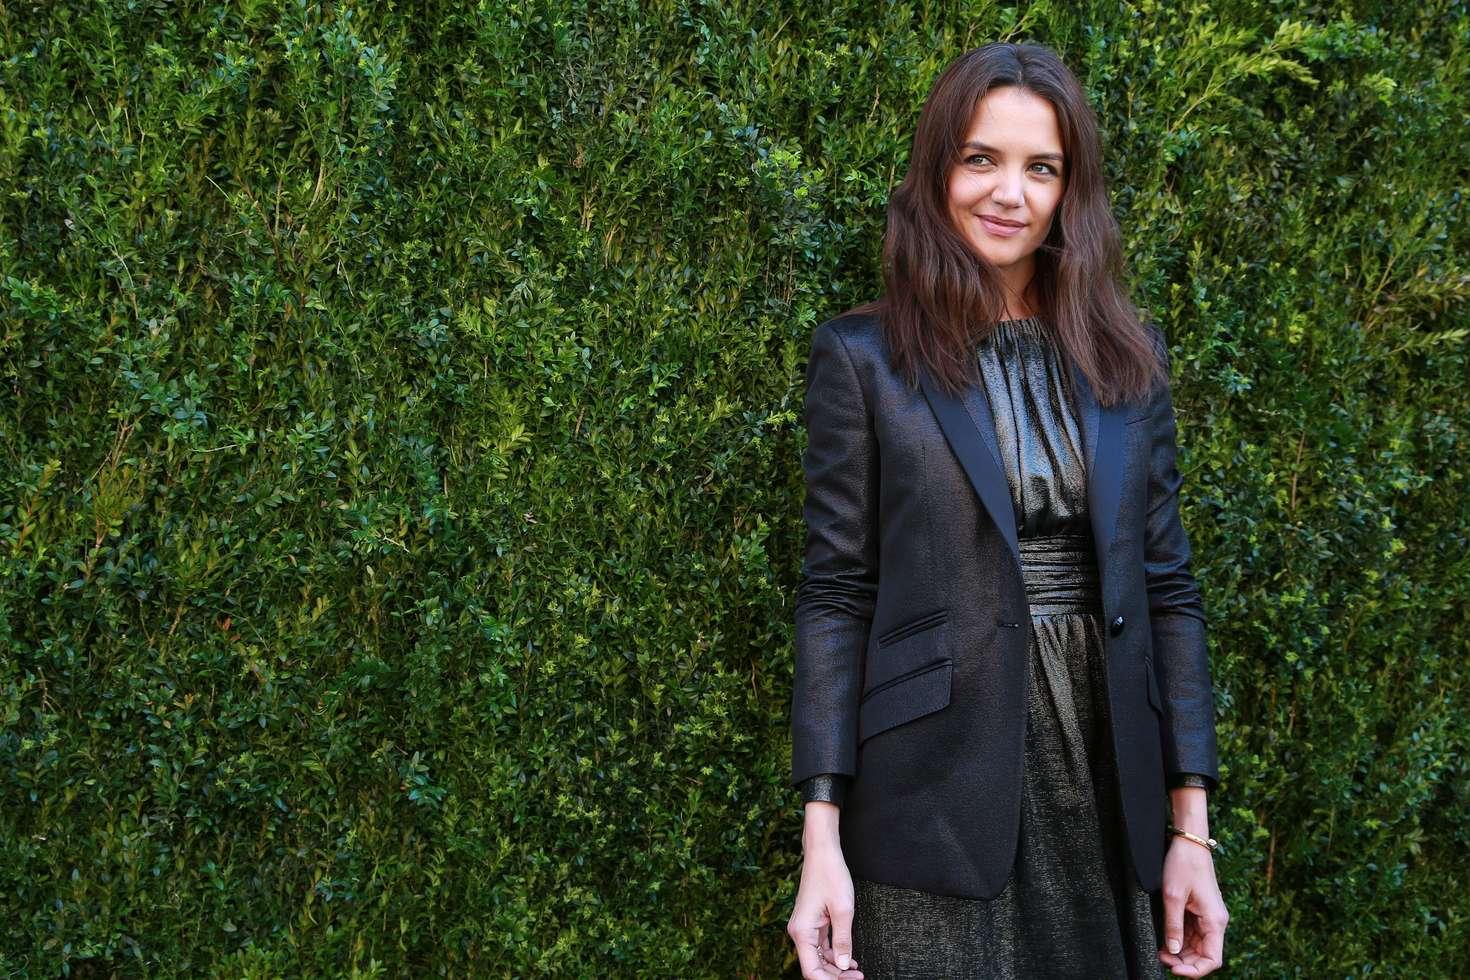 Katie Holmes 2016 : Katie Holmes: Women Filmmakers Luncheon at Tribeca Film Festival 2016 -01